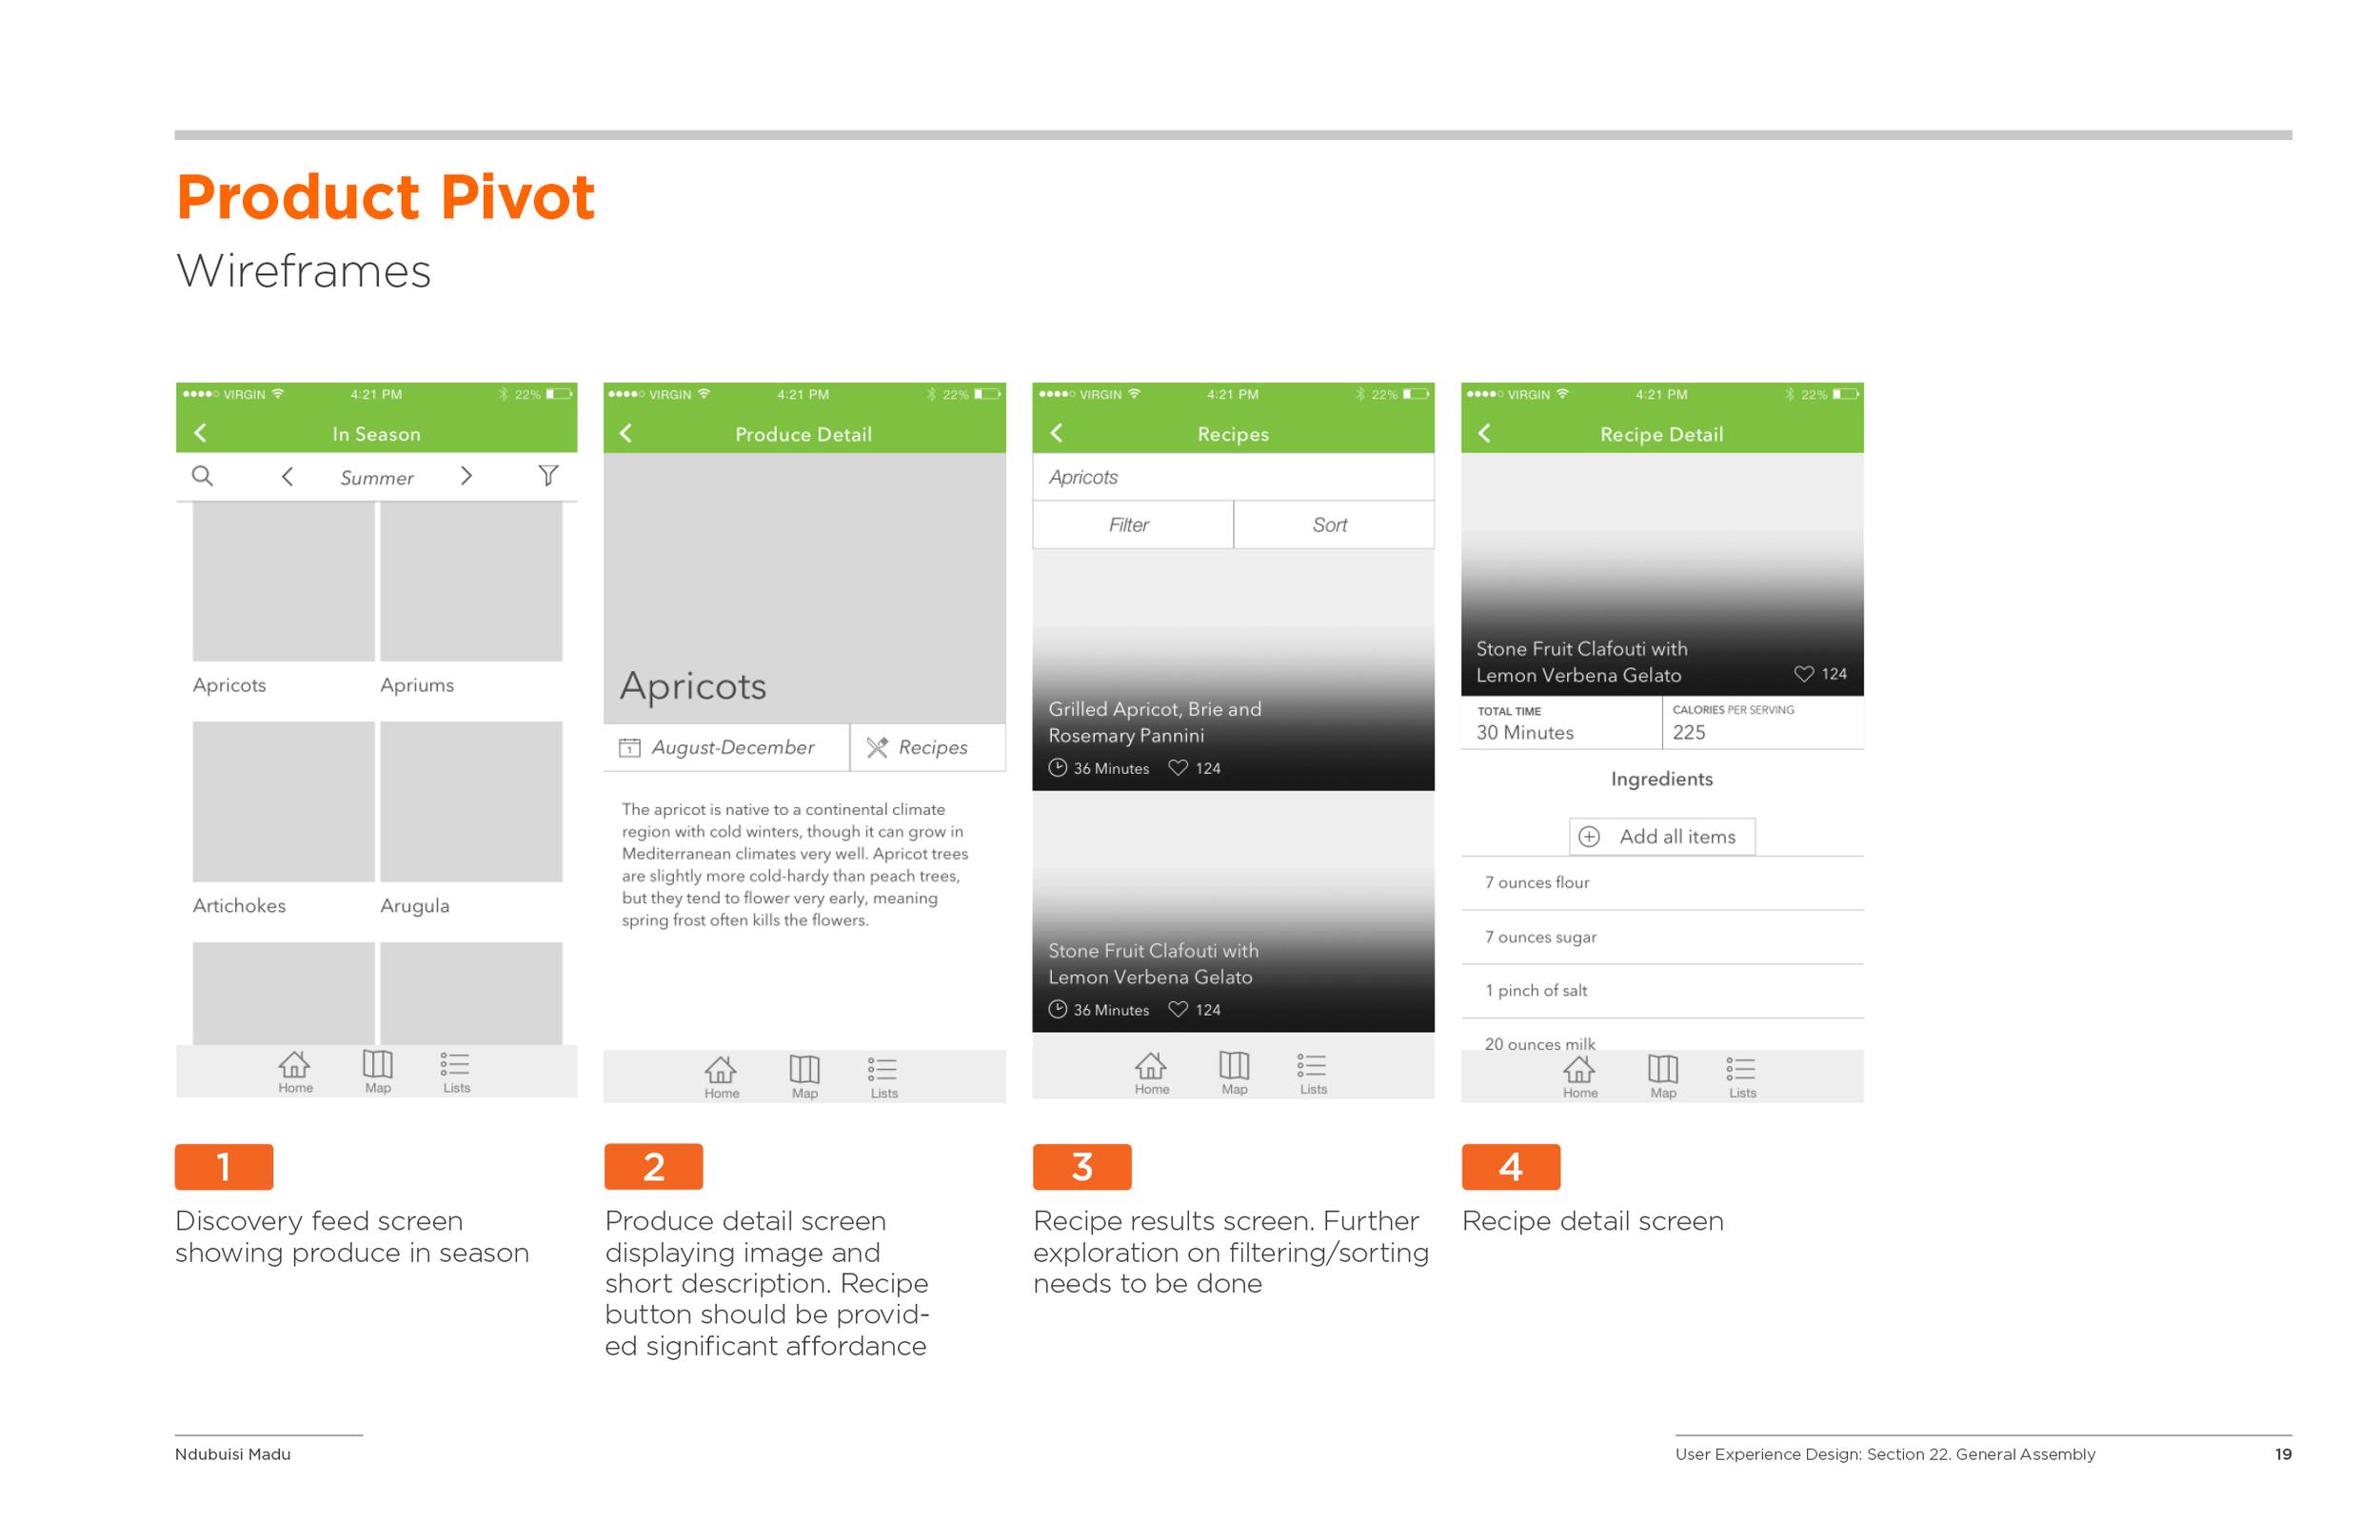 UXD22_NduMadu_Final_Presentation_Splash19.jpg